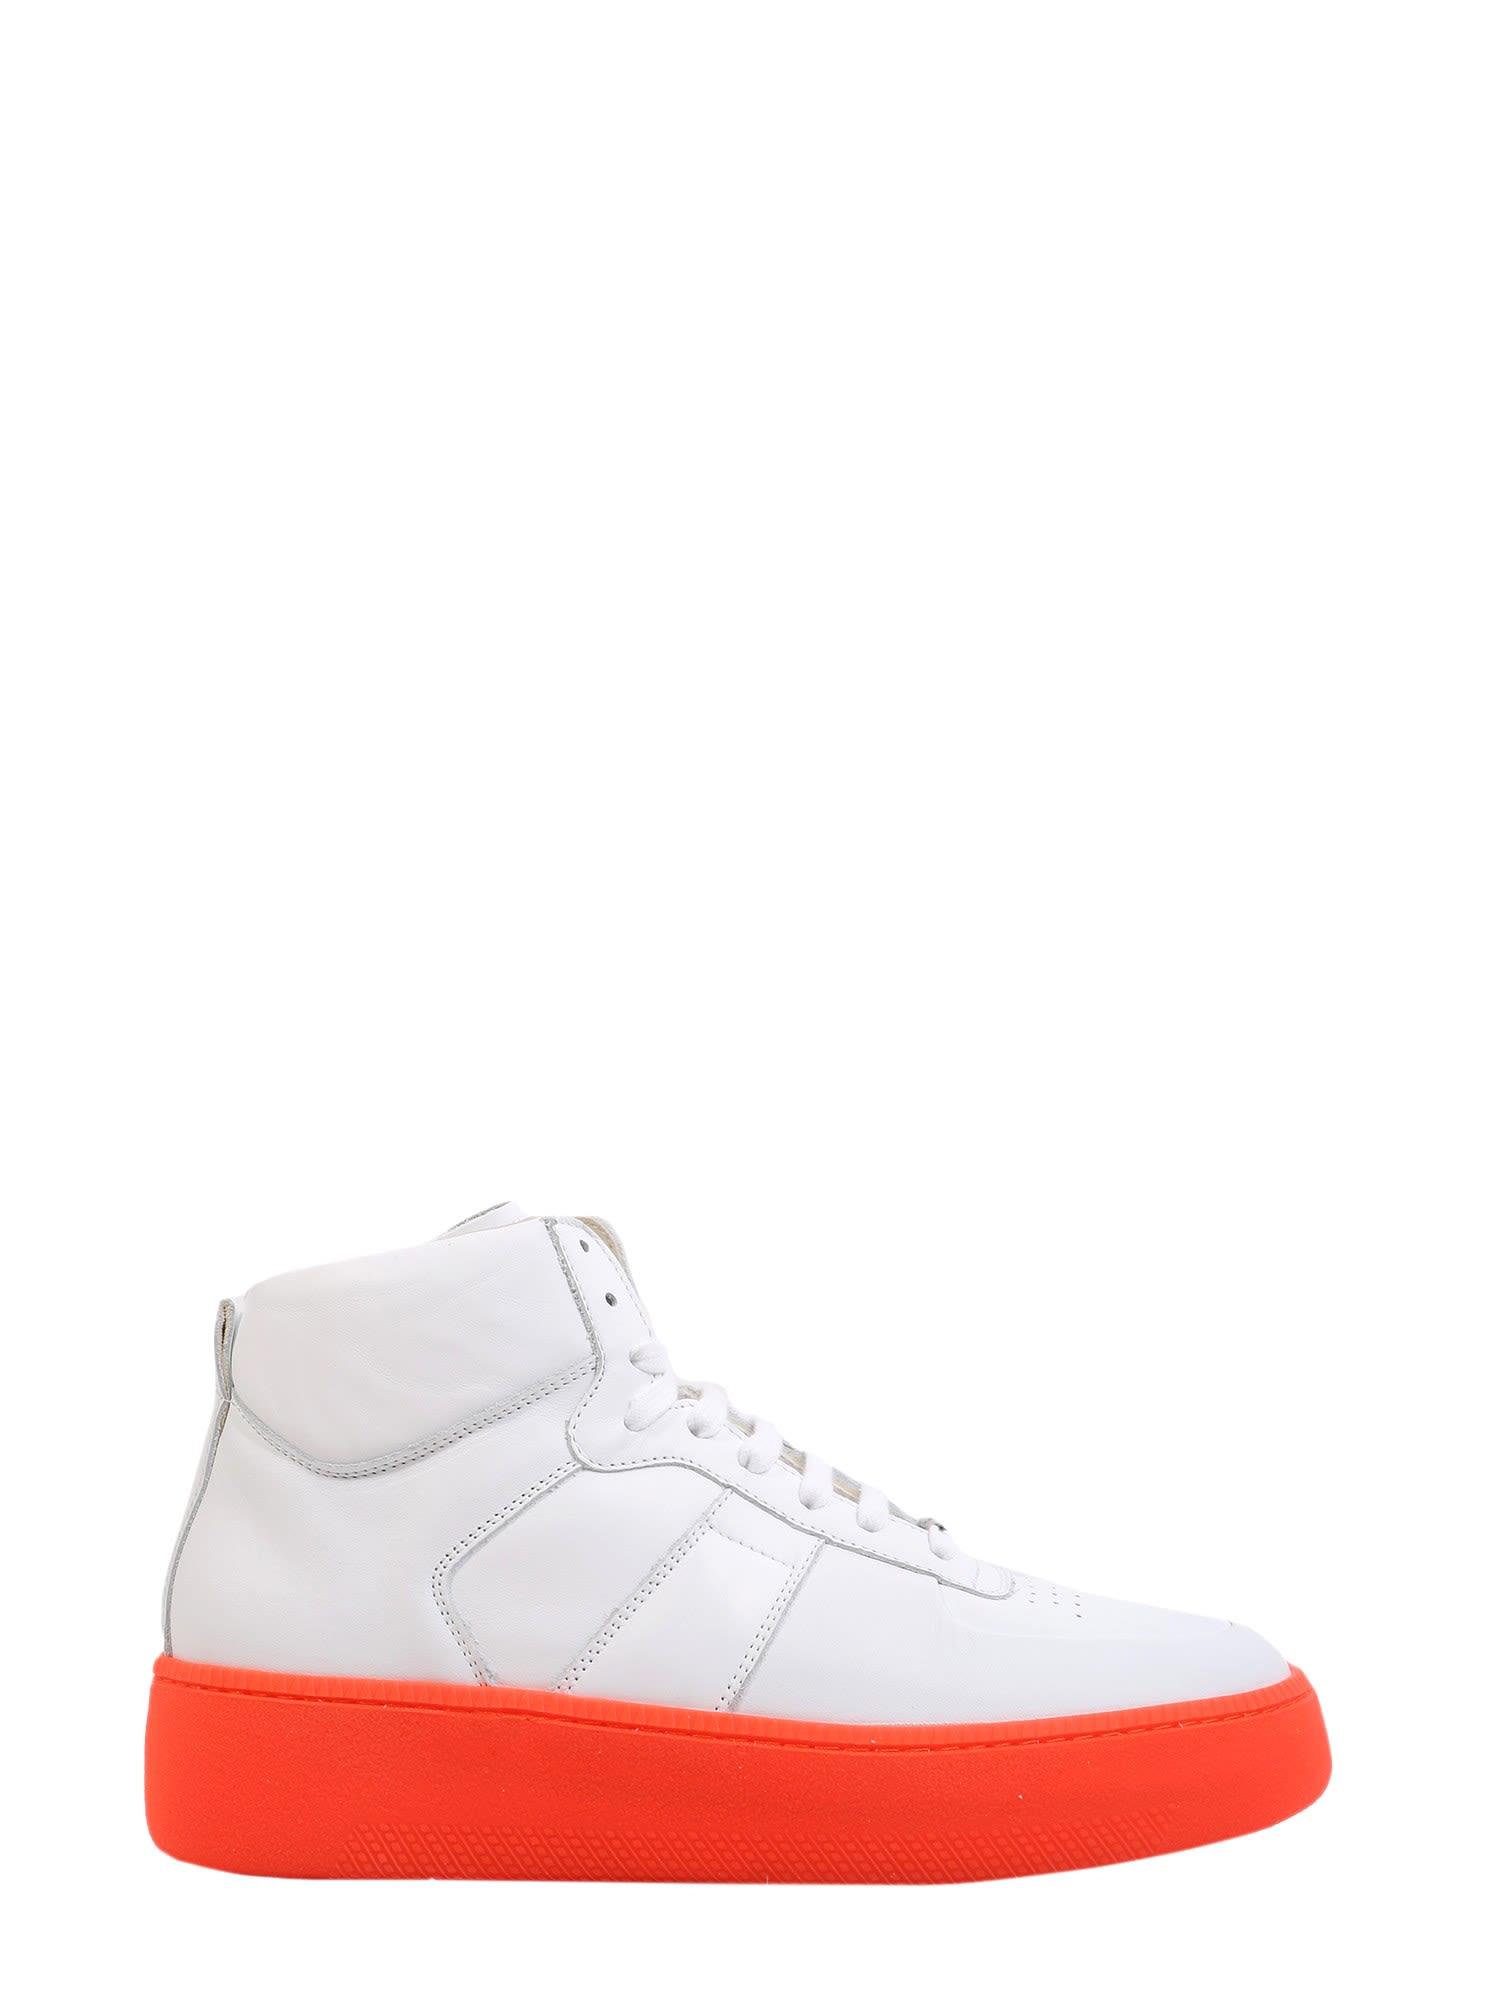 b3034db134a0 Maison Margiela Maison Margiela High Top Sneakers - BIANCO ...